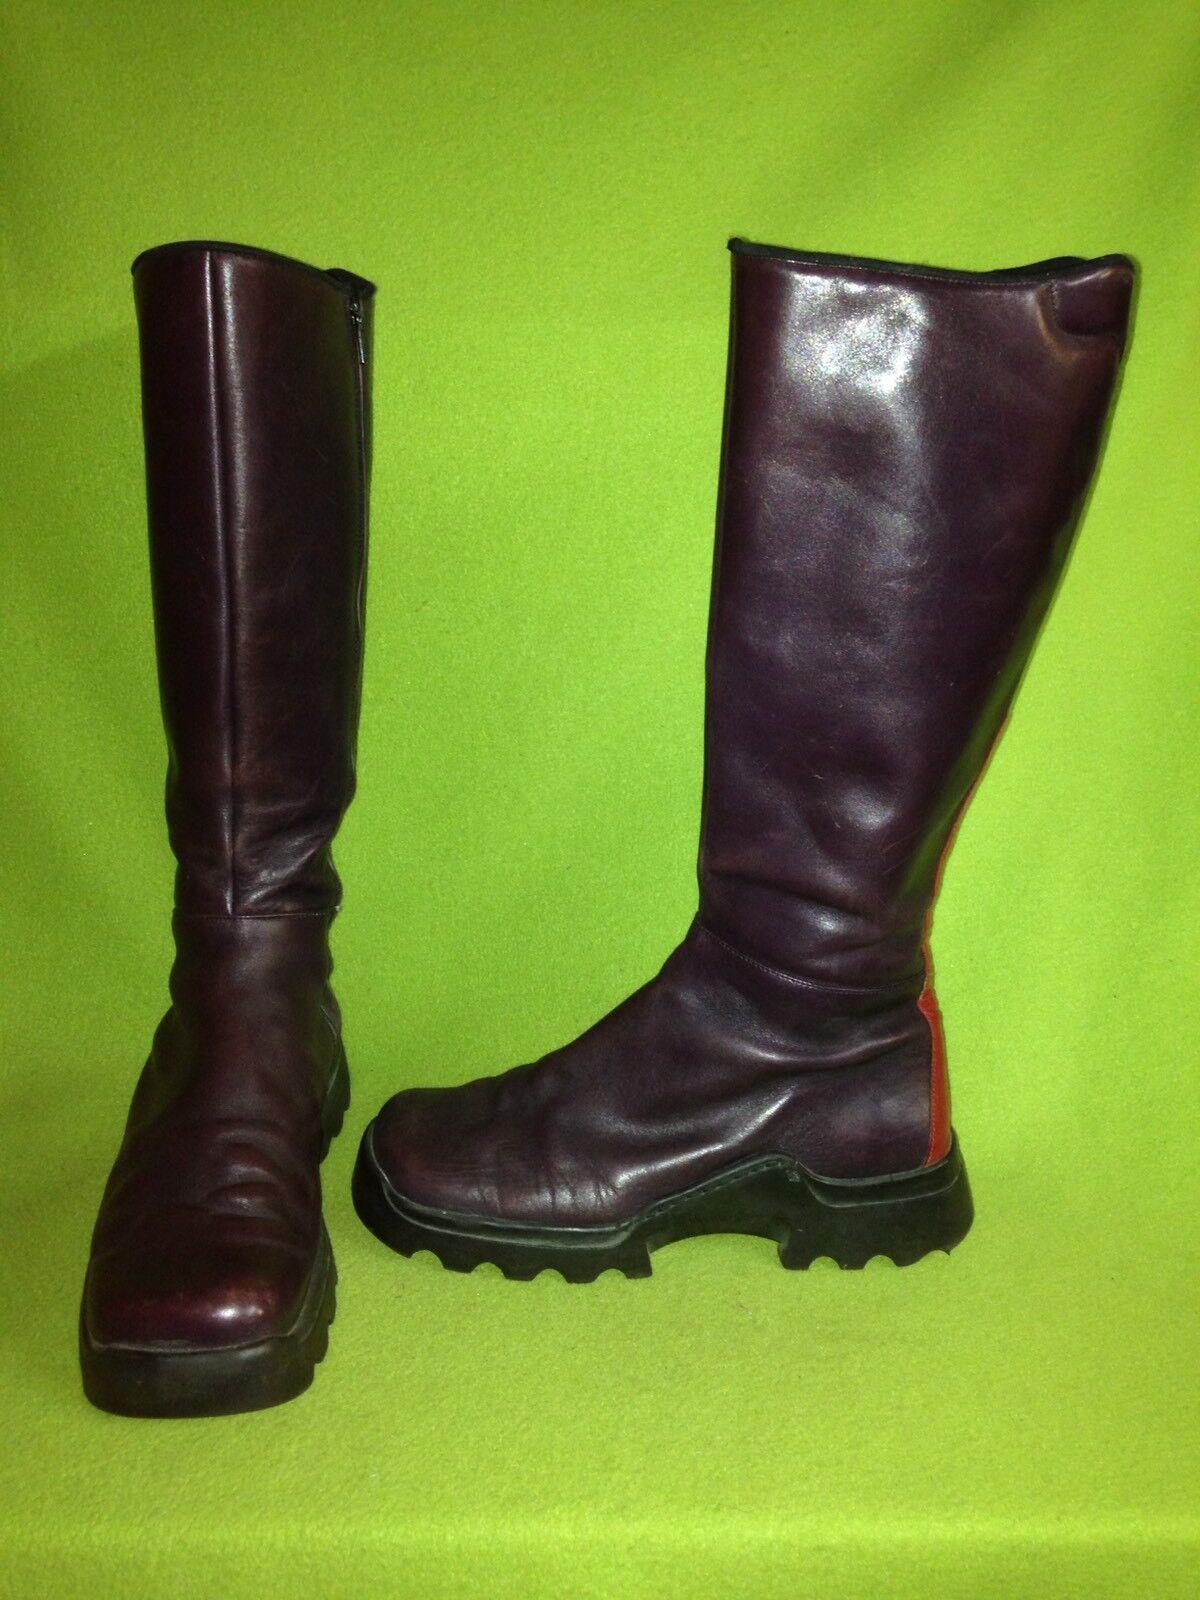 Purple Cinderella Knee-High Boots with Red Heel detail 9